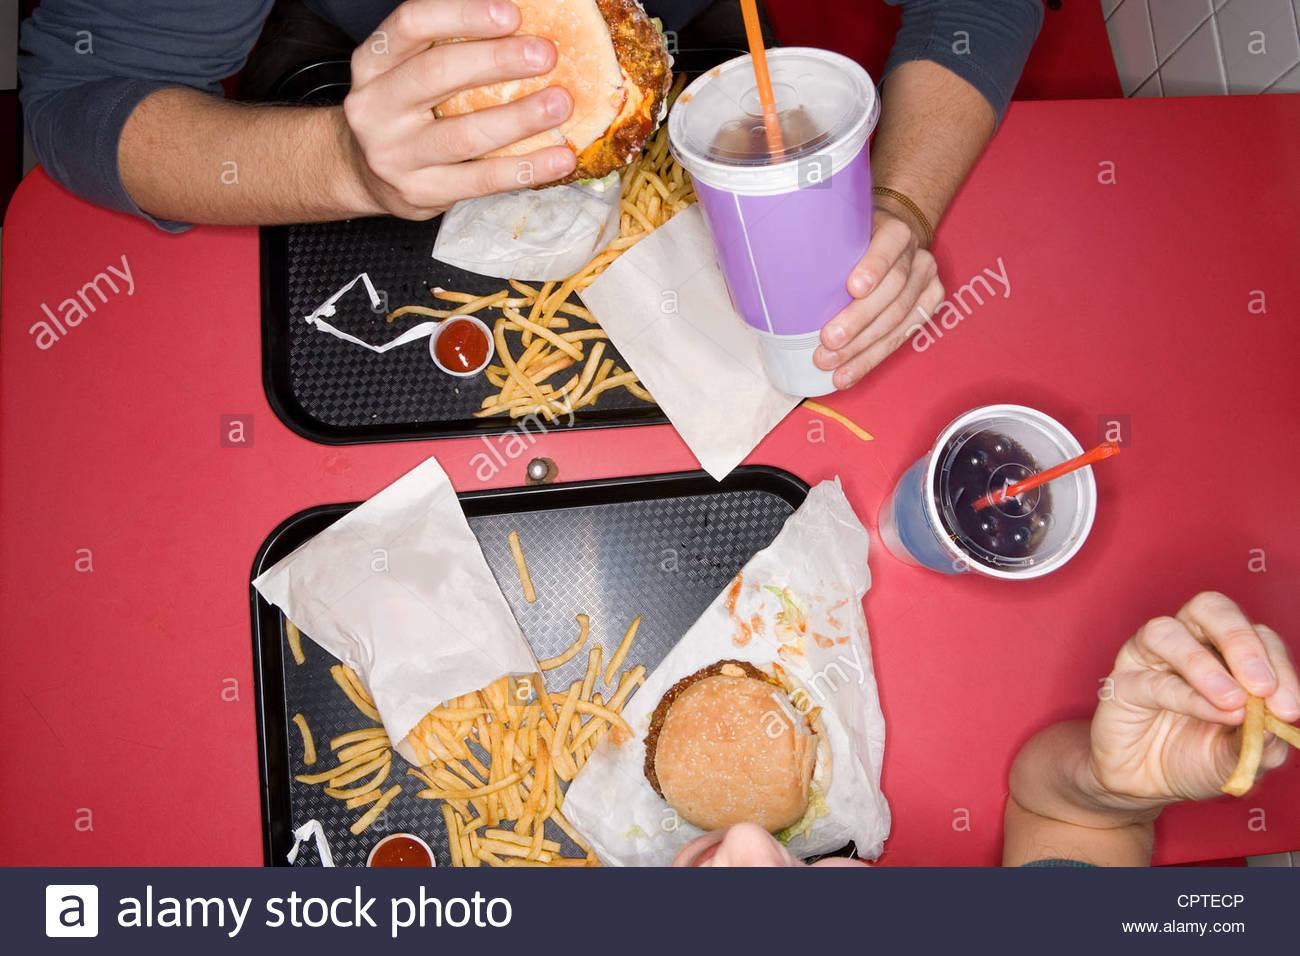 Vista aérea de la pareja comer comida rápida Imagen De Stock